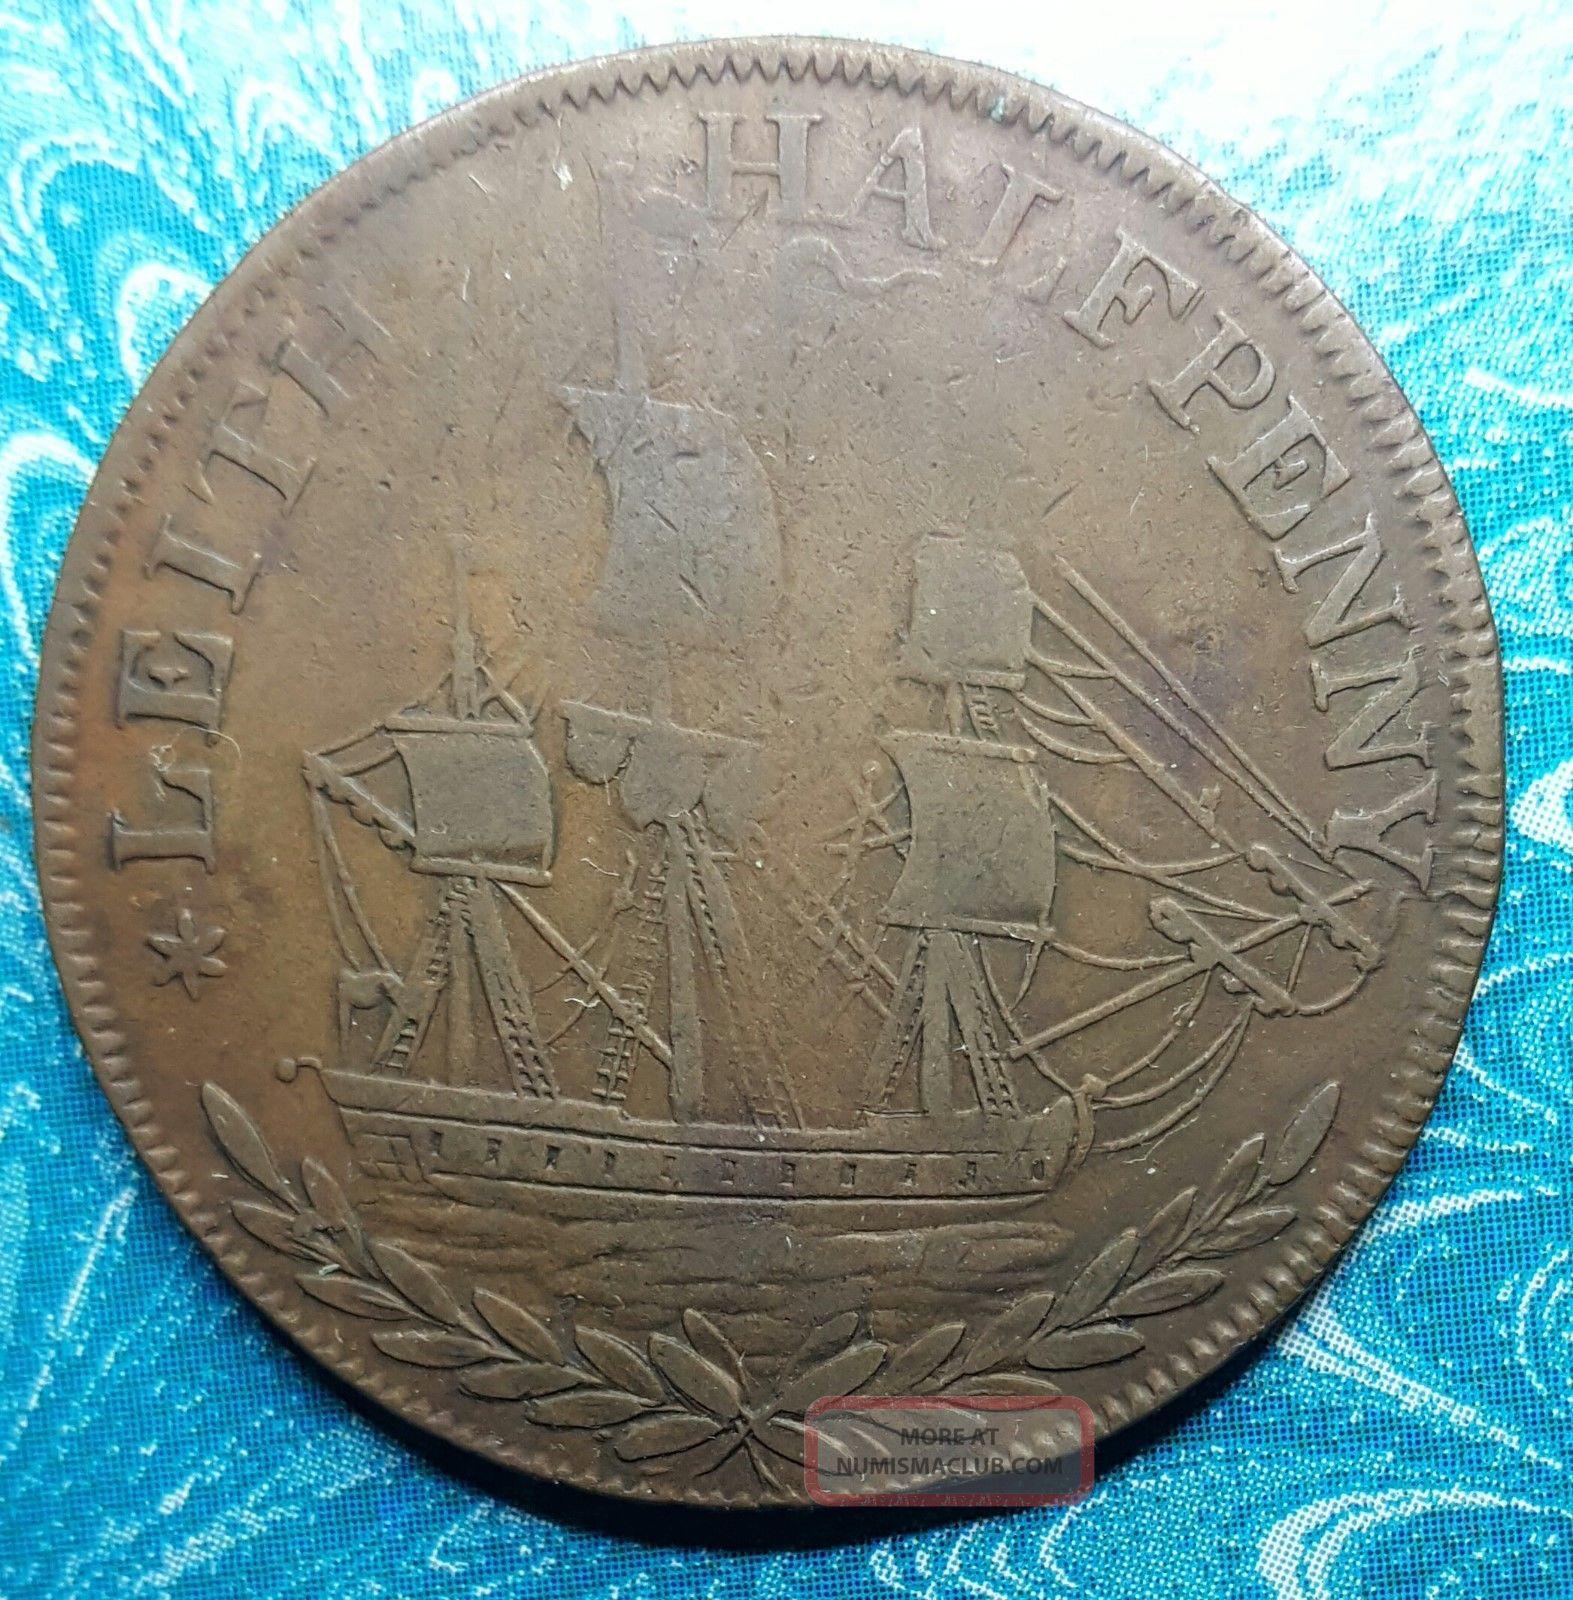 1797 Scotland Lothian Leith Half Penny Conder Token D&h 61 UK (Great Britain) photo